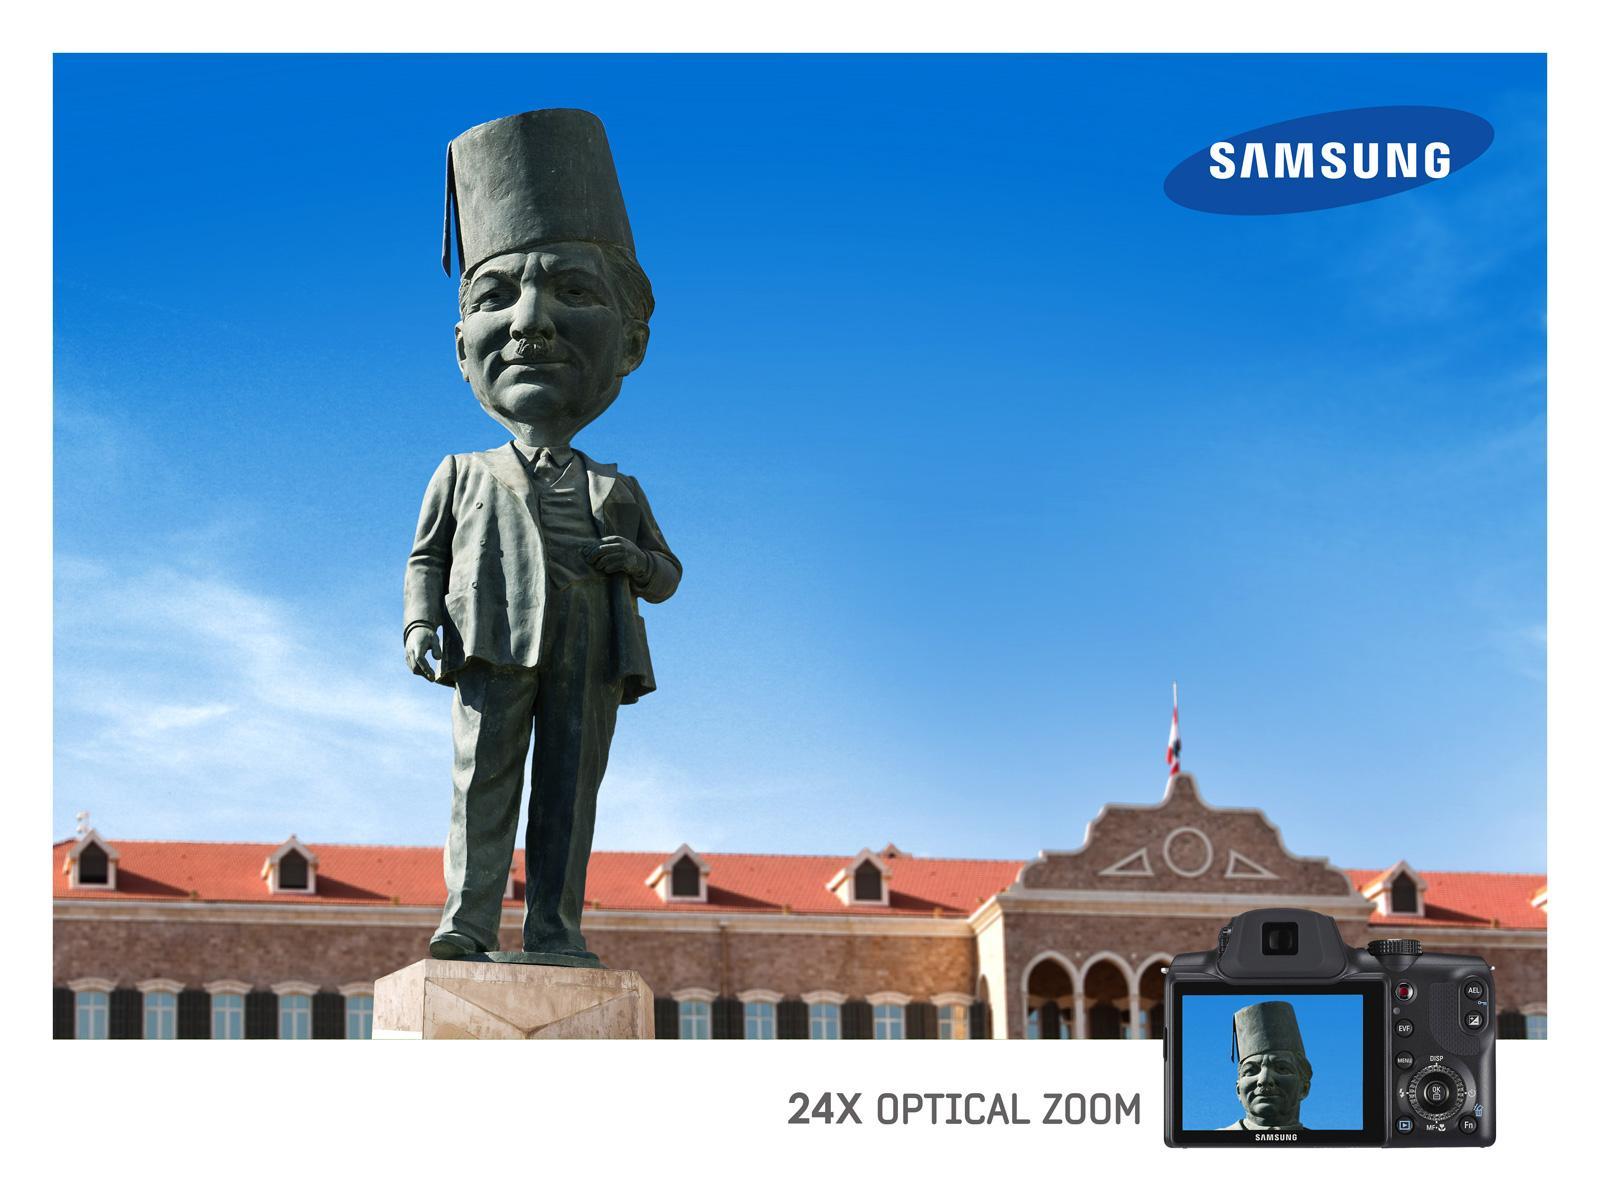 Samsung Print Ad -  Optical Zoom, Statue